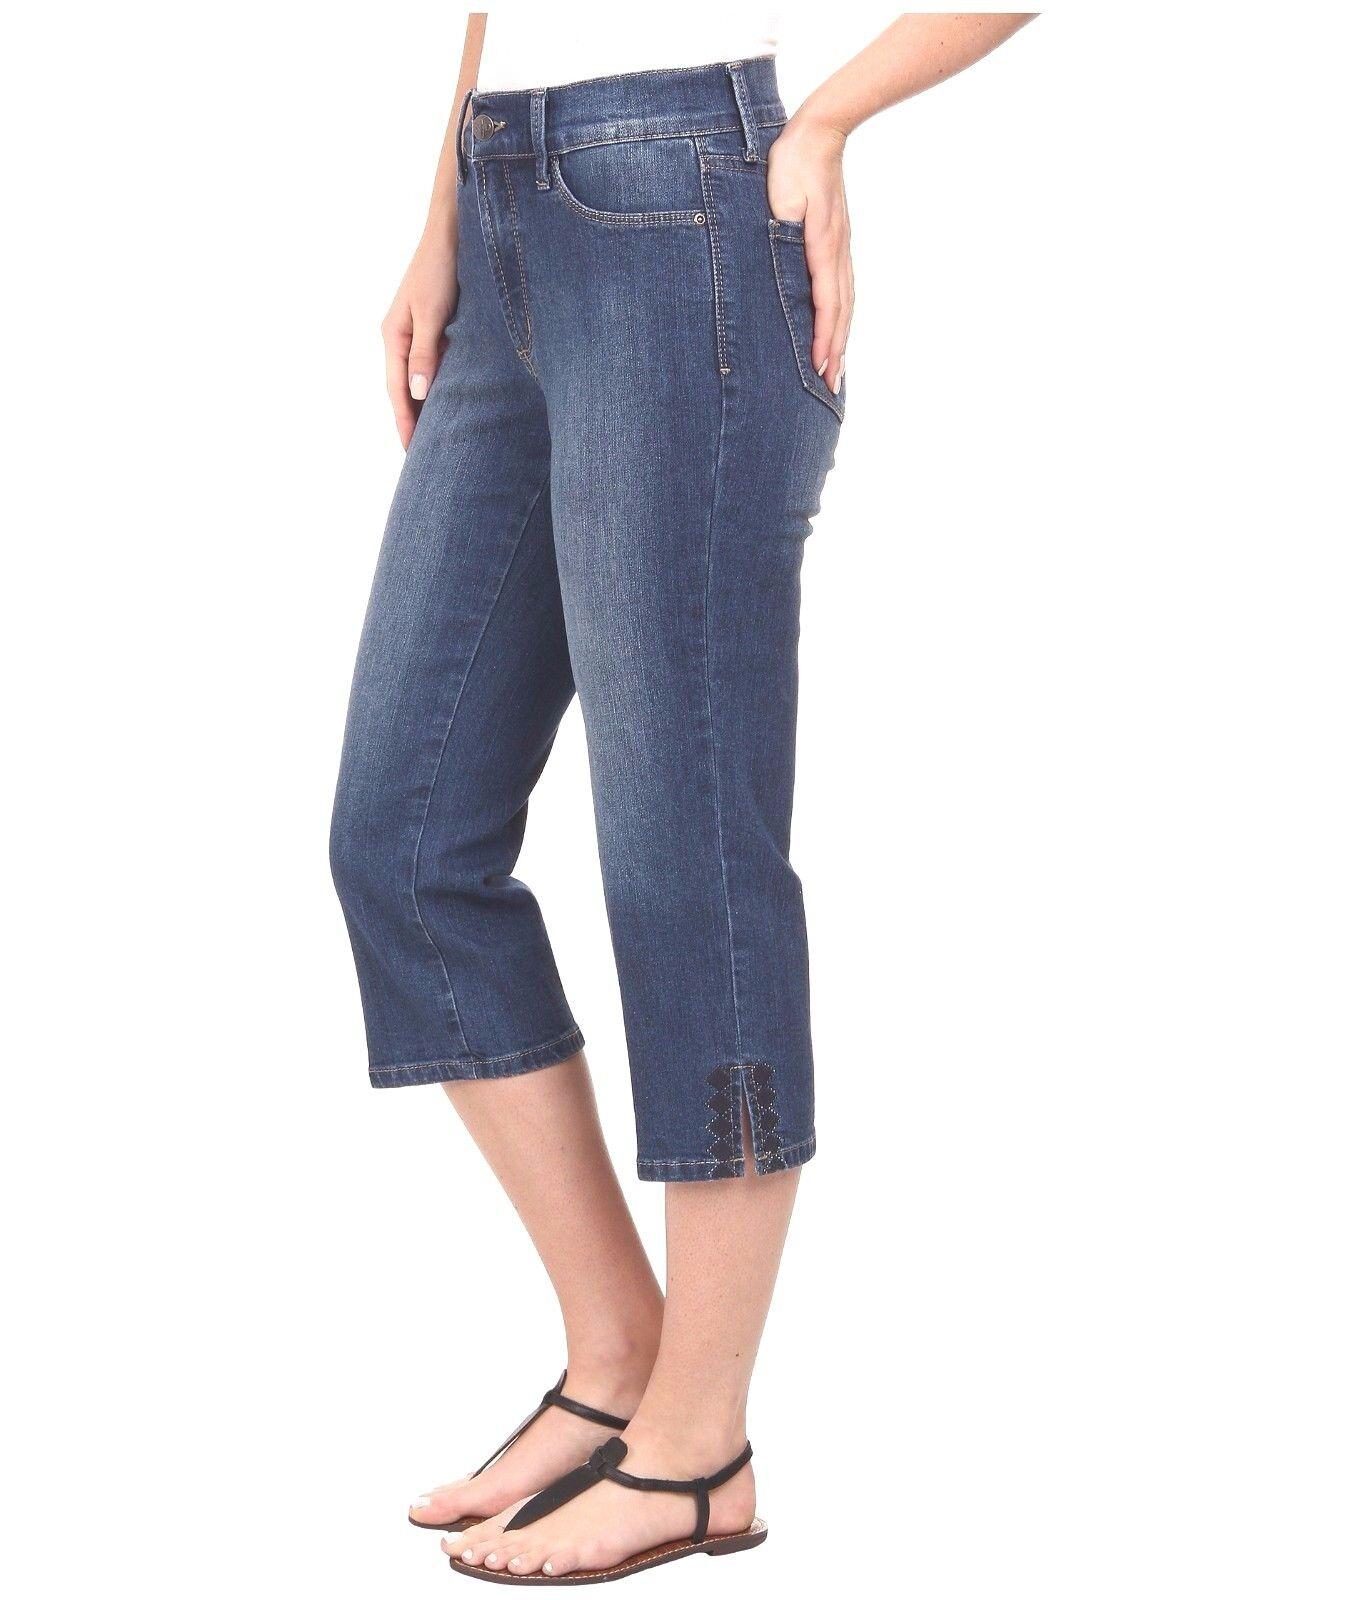 NEW NYDJ Not Your Daughters Jeans CROP capri Ariel Whittier medium wash sz 6